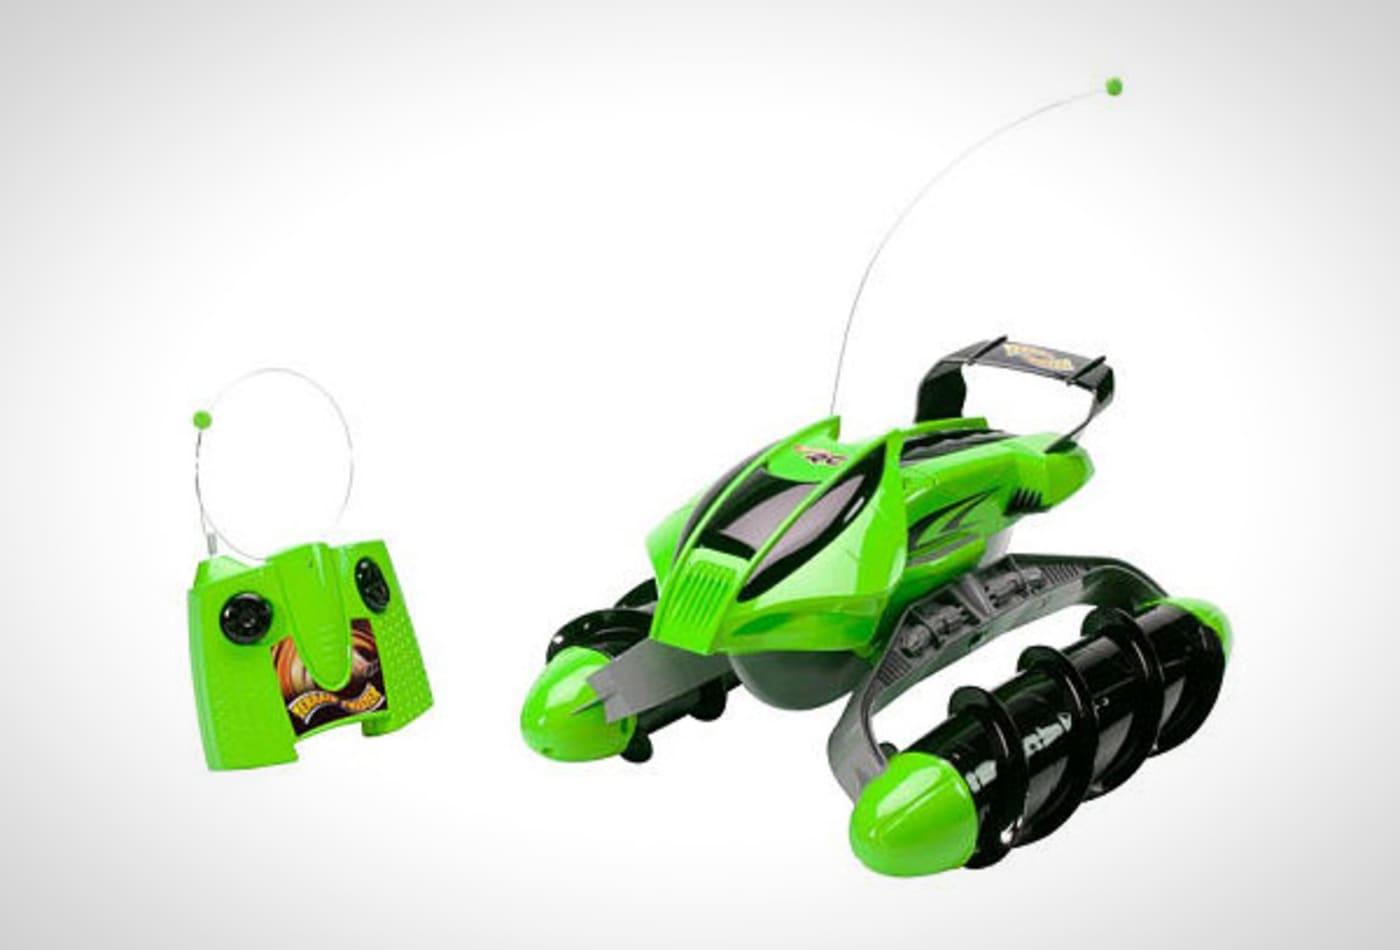 hot-toys-2012-hotwheels-terrain-twister.jpg